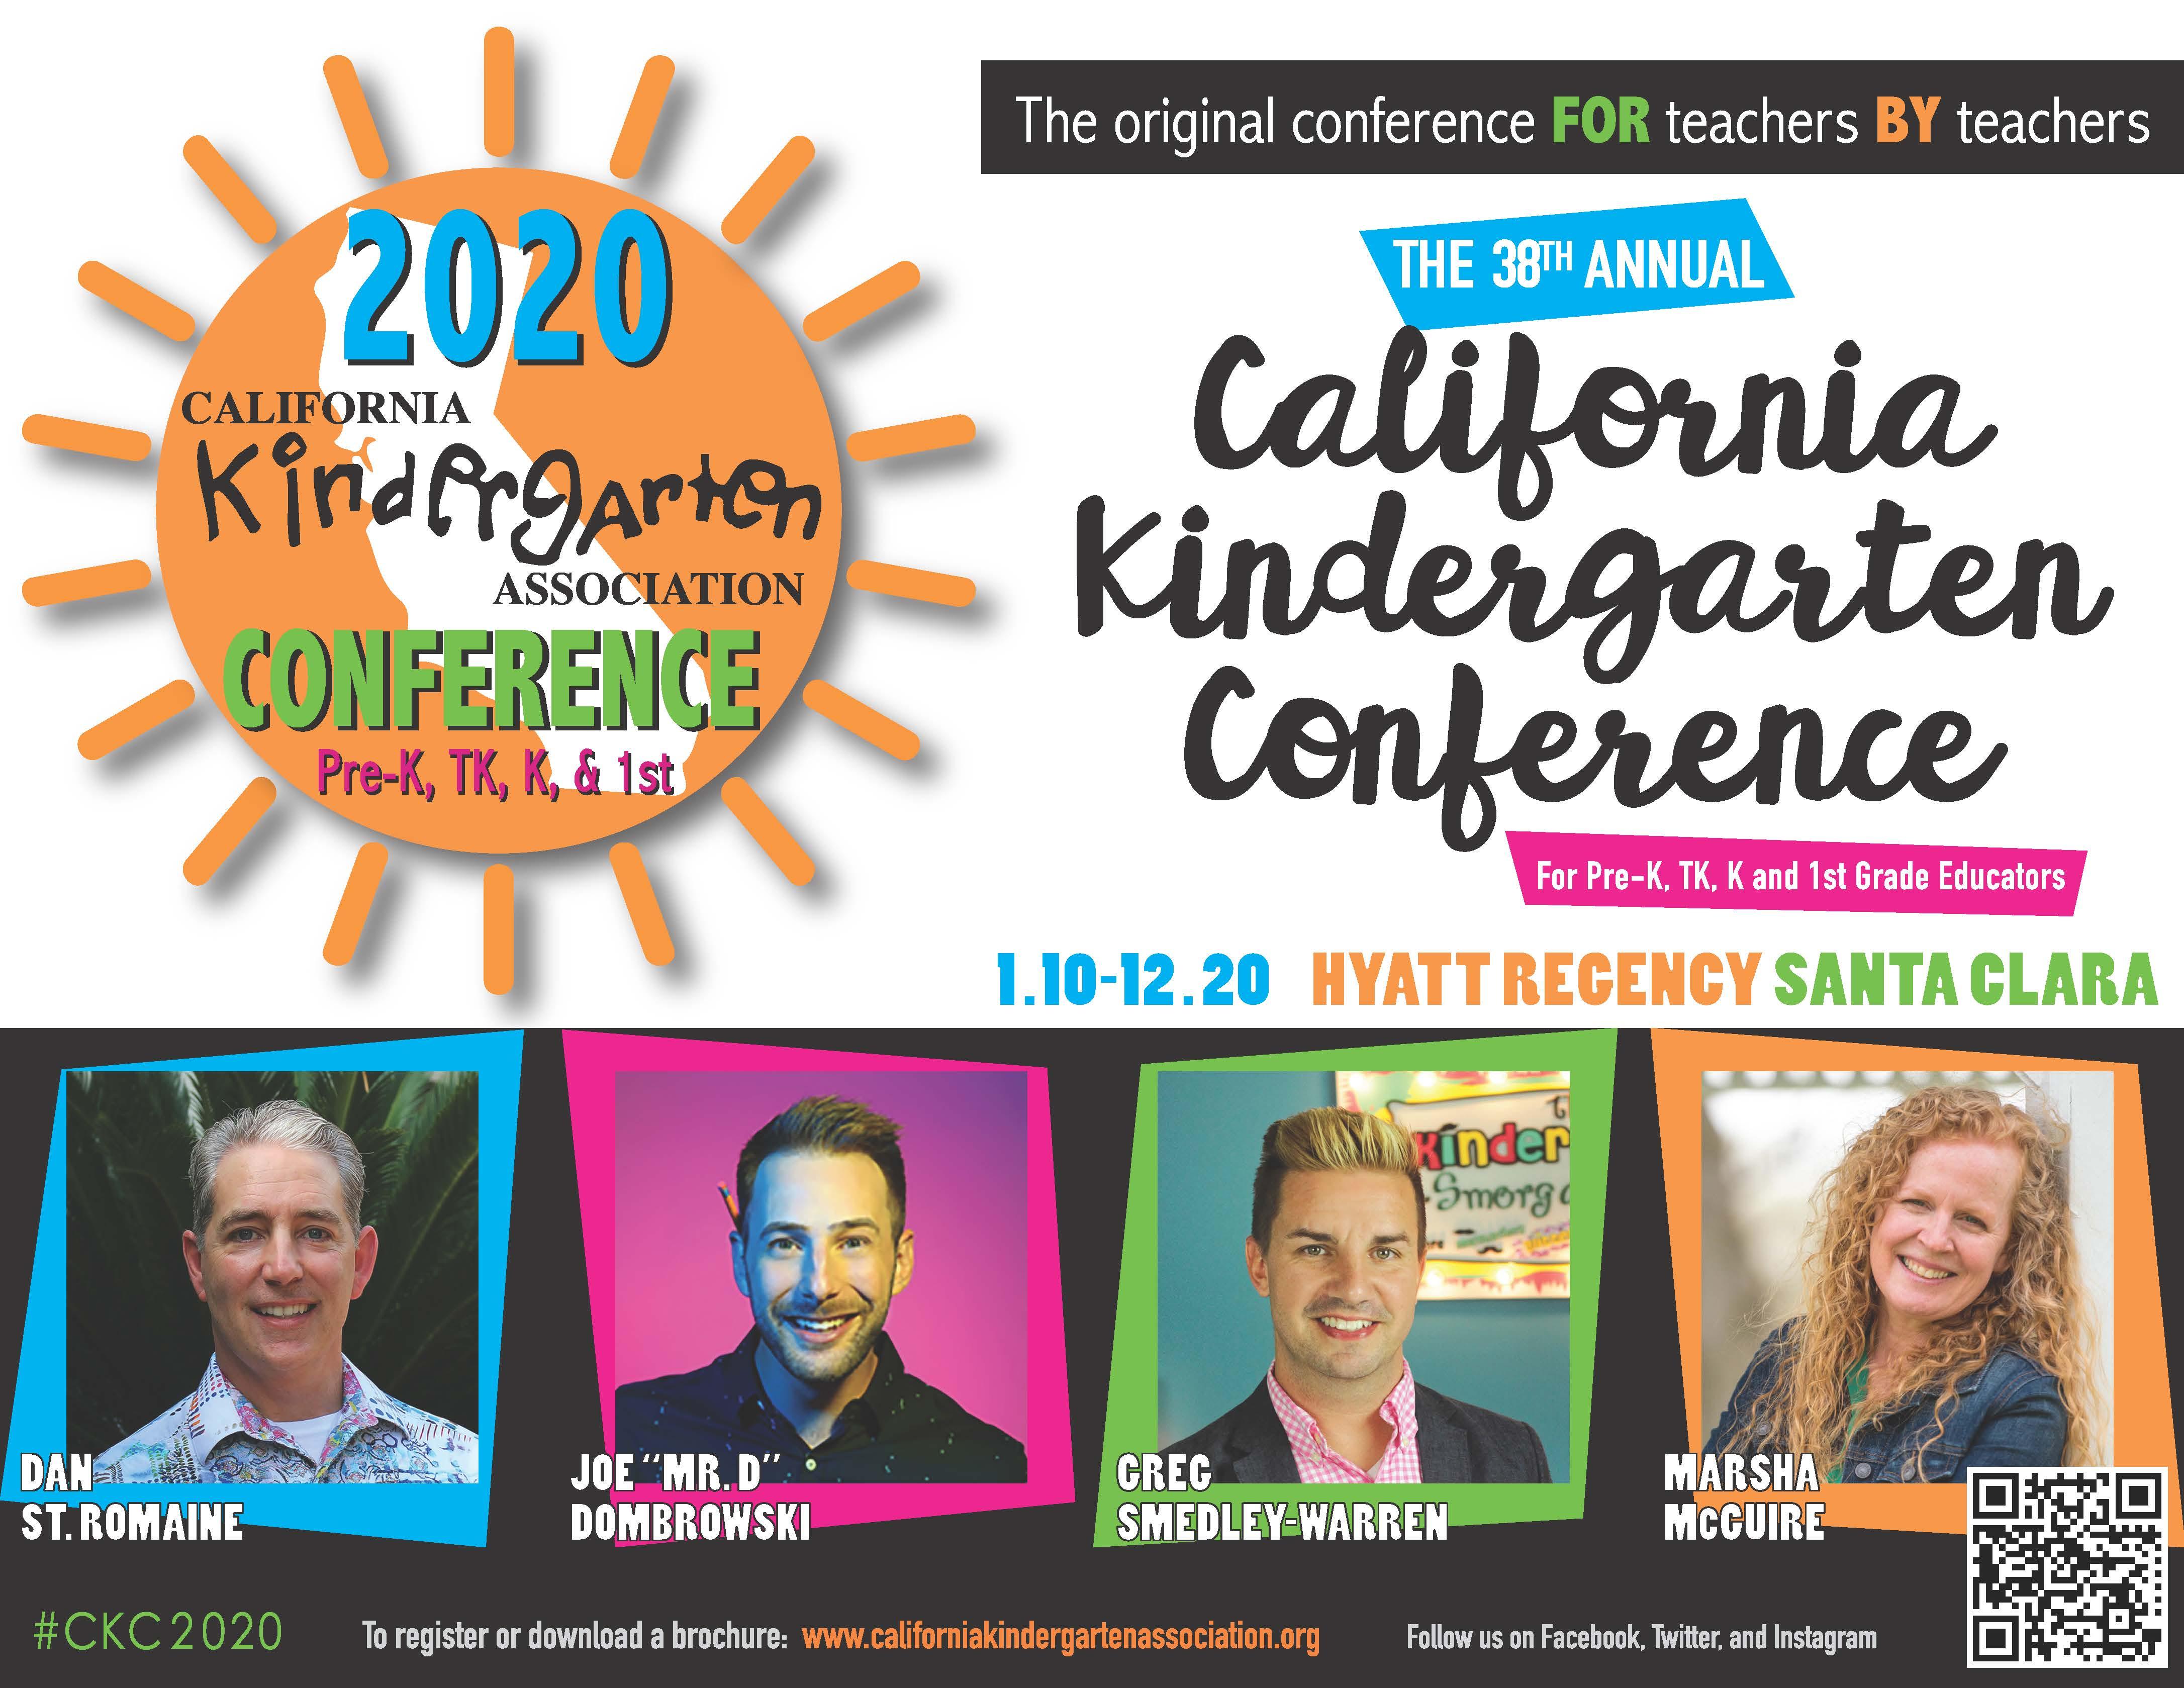 California Kindergarten Conference | California Kindergarten